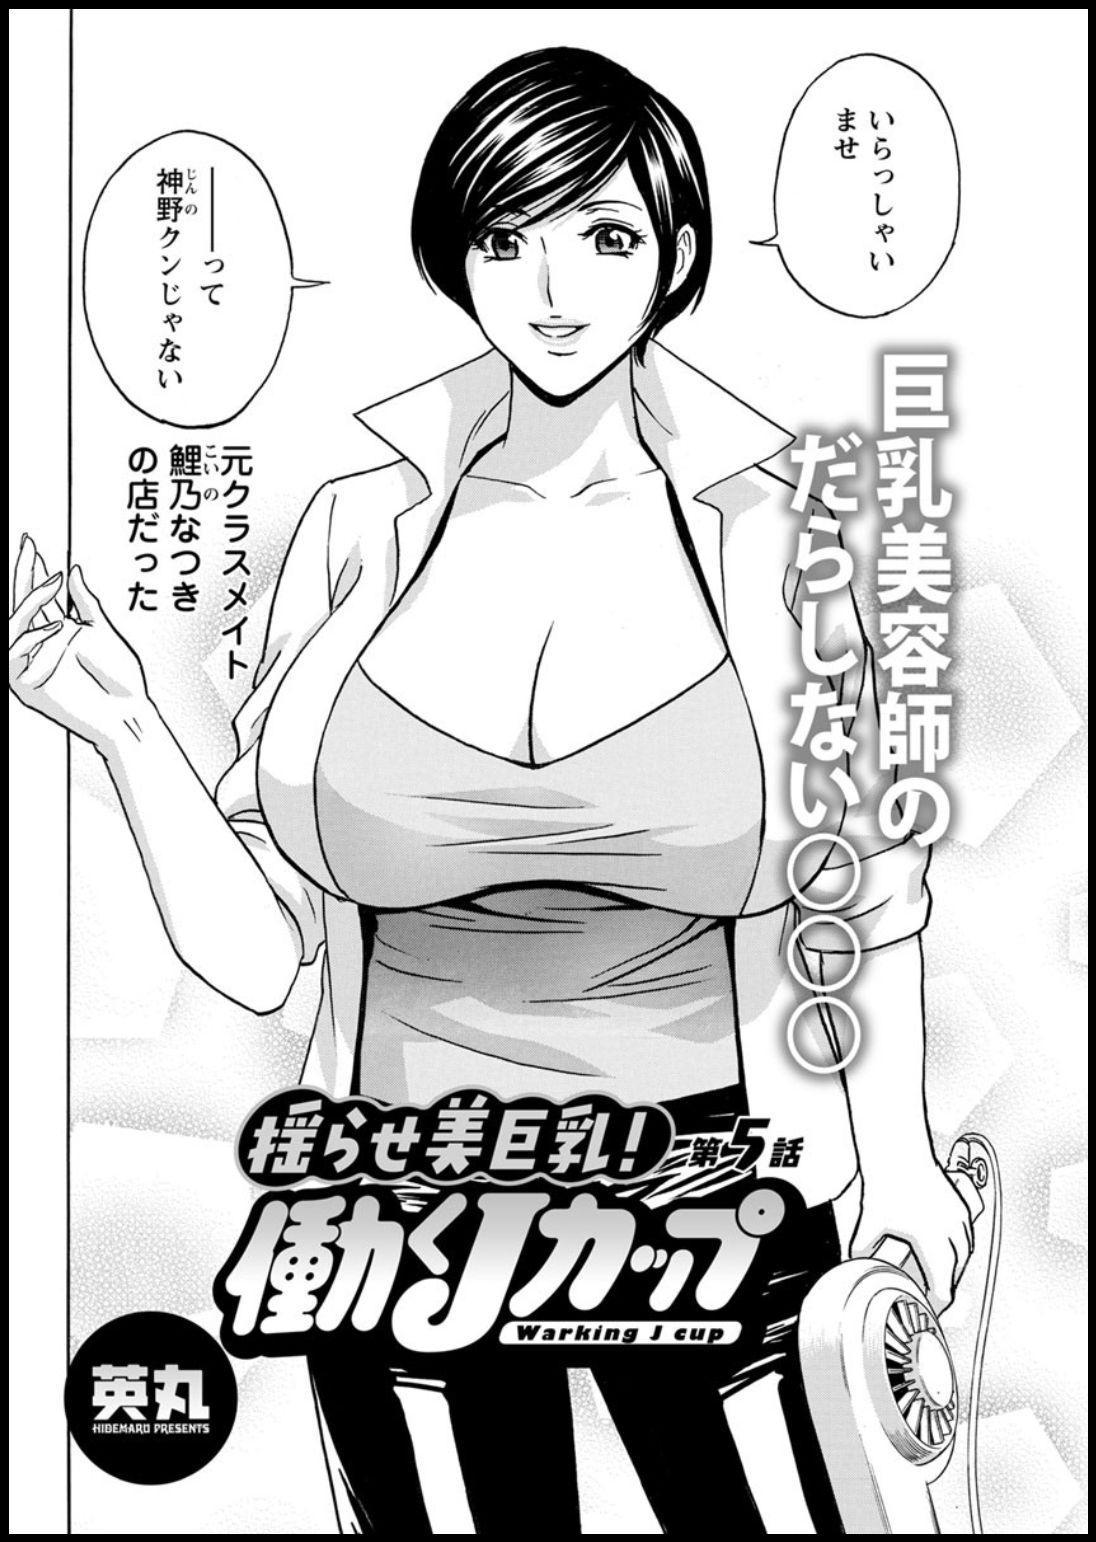 [Hidemaru] Yurase Bikyonyuu! Hataraku J-Cup Ch. 1-5 [Digital] 75